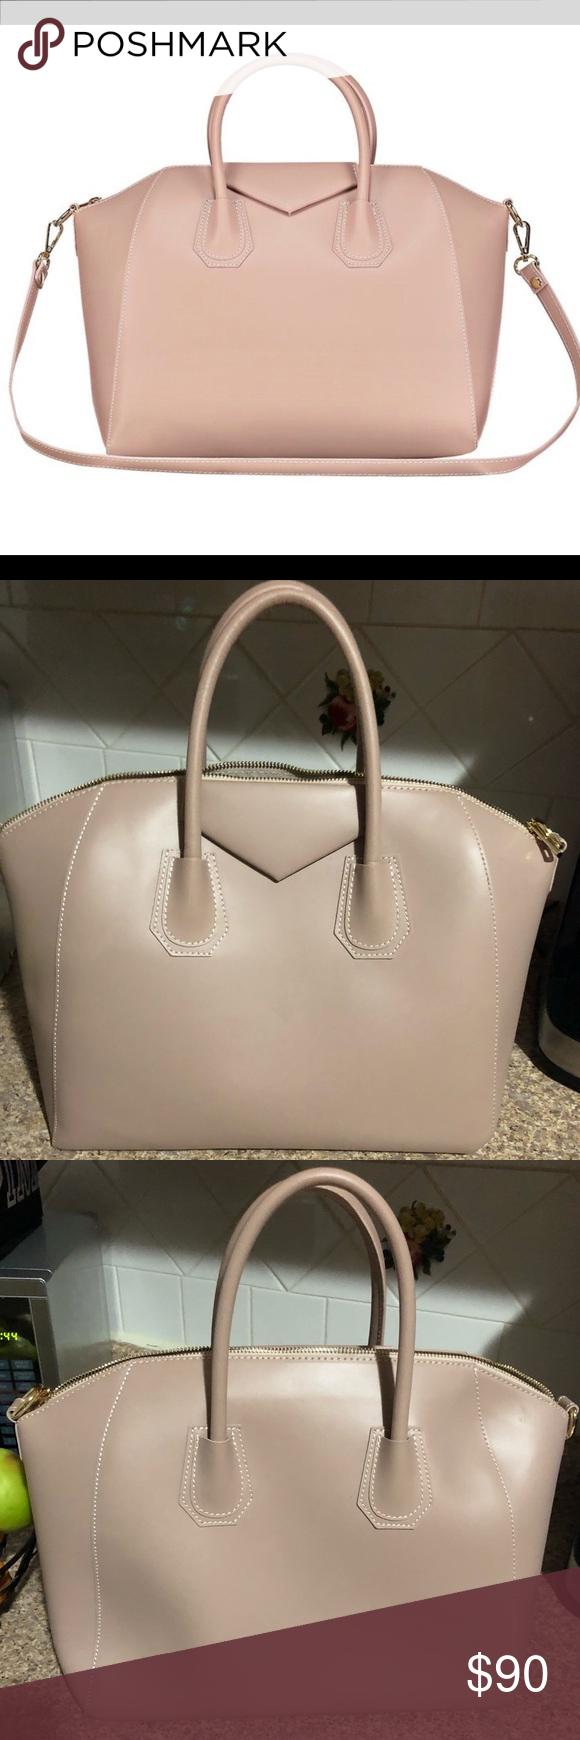 Fashion Drug GiGi Nude Pink Large Bag If you guys have never heard of the 8751c174bebd4